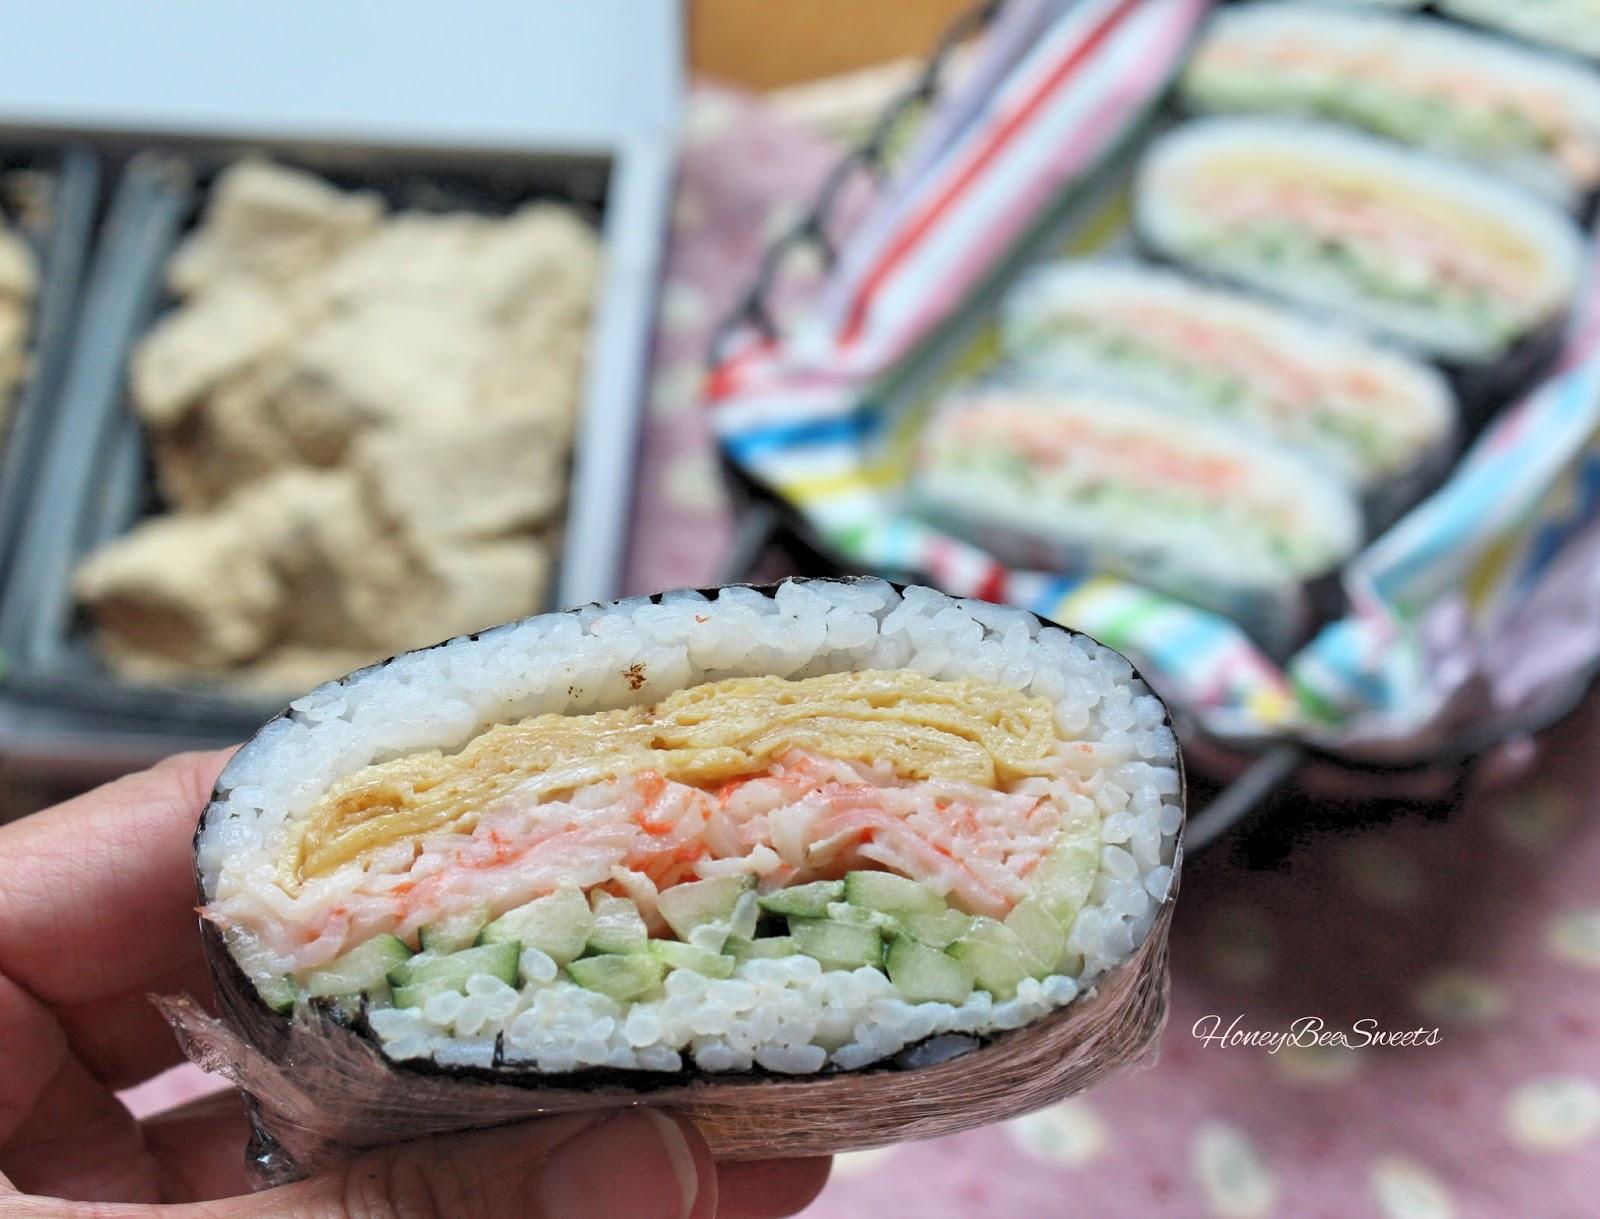 Sandwich)